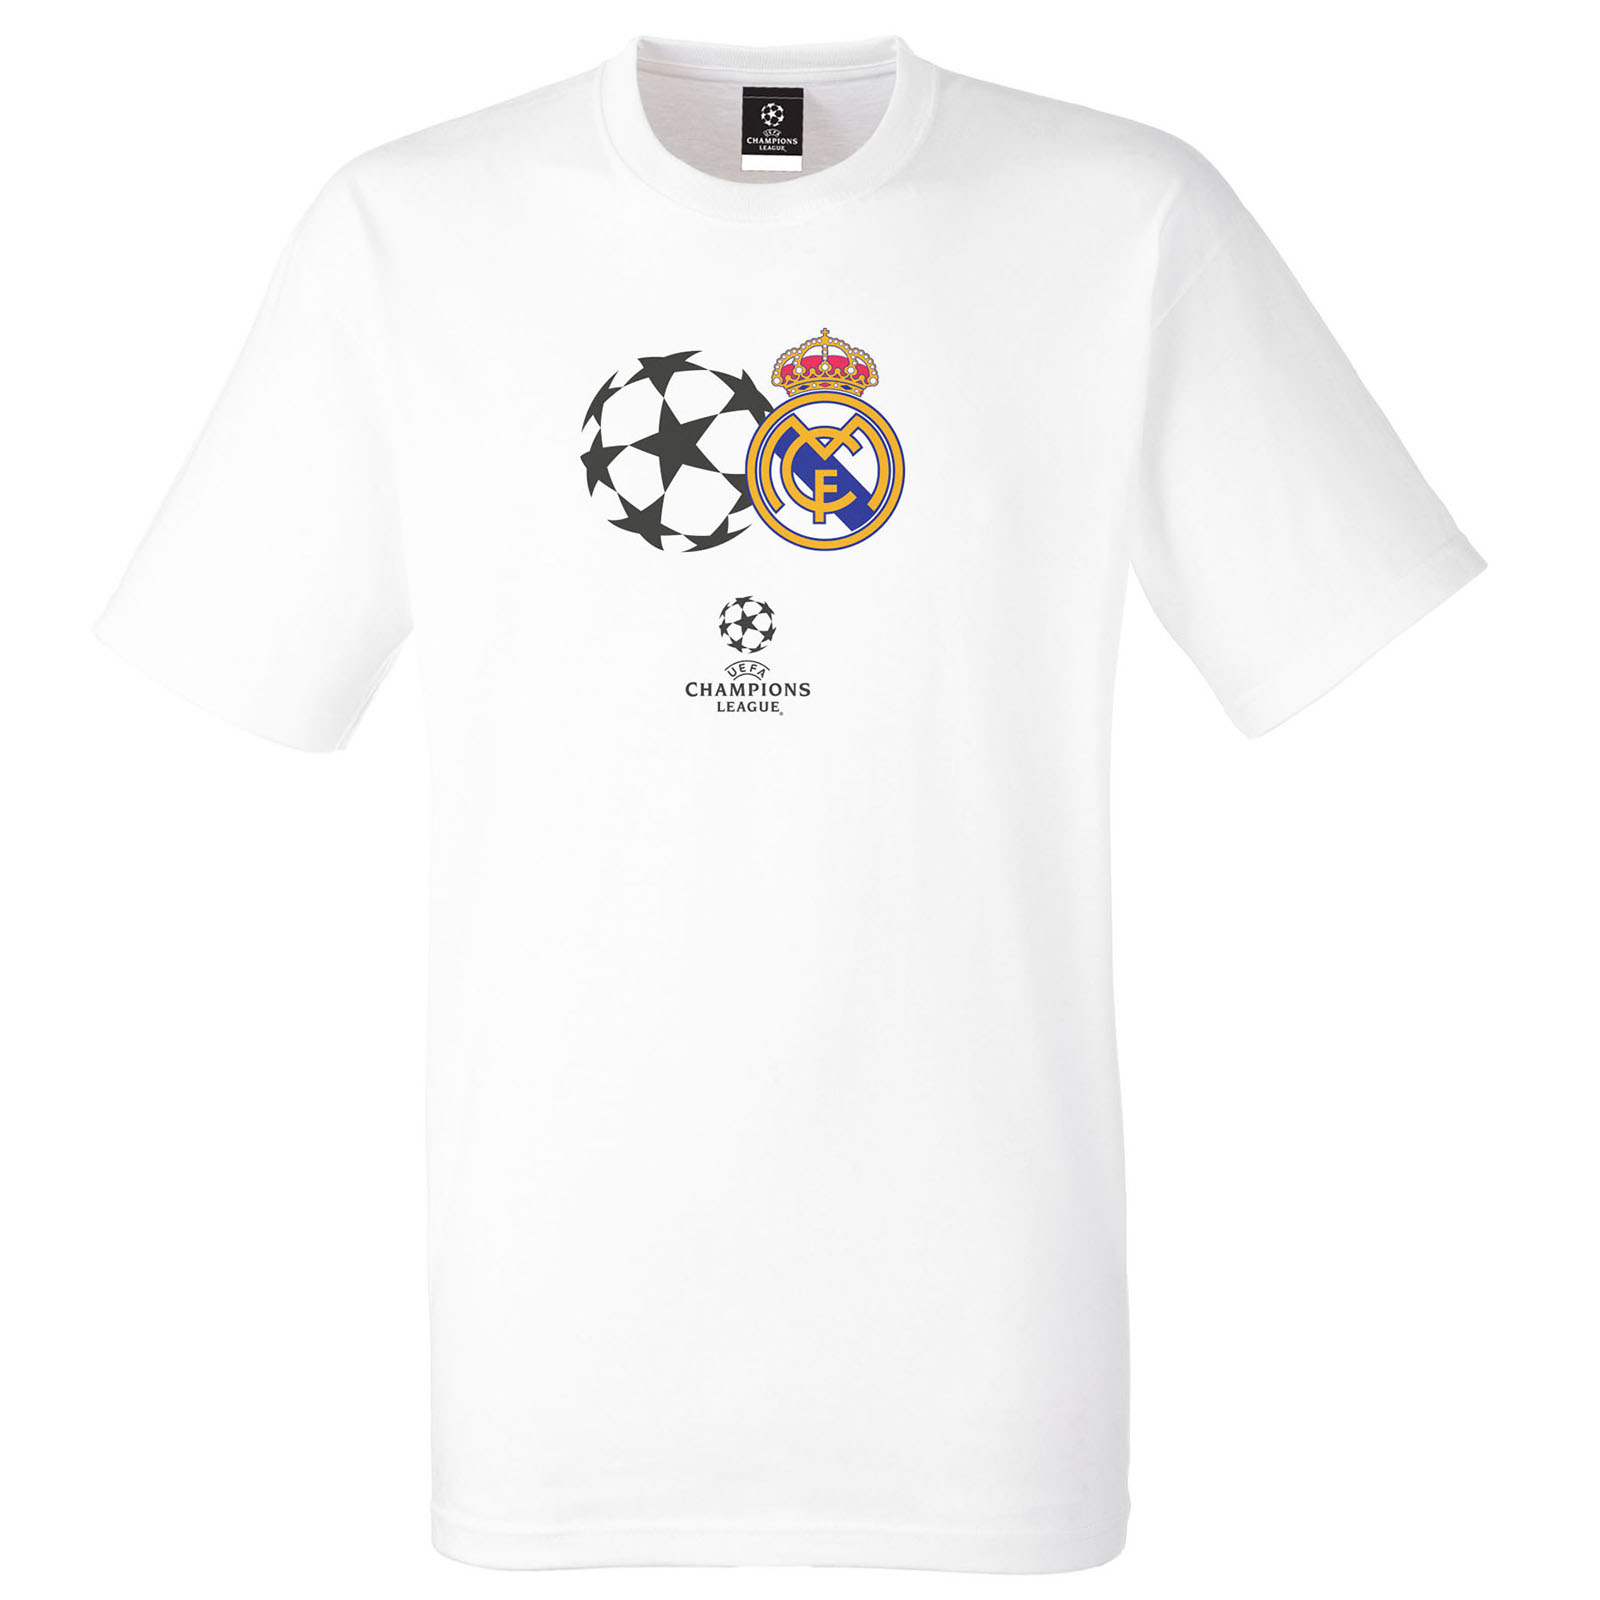 Real Madrid UEFA Champions League T-Shirt - White - Mens